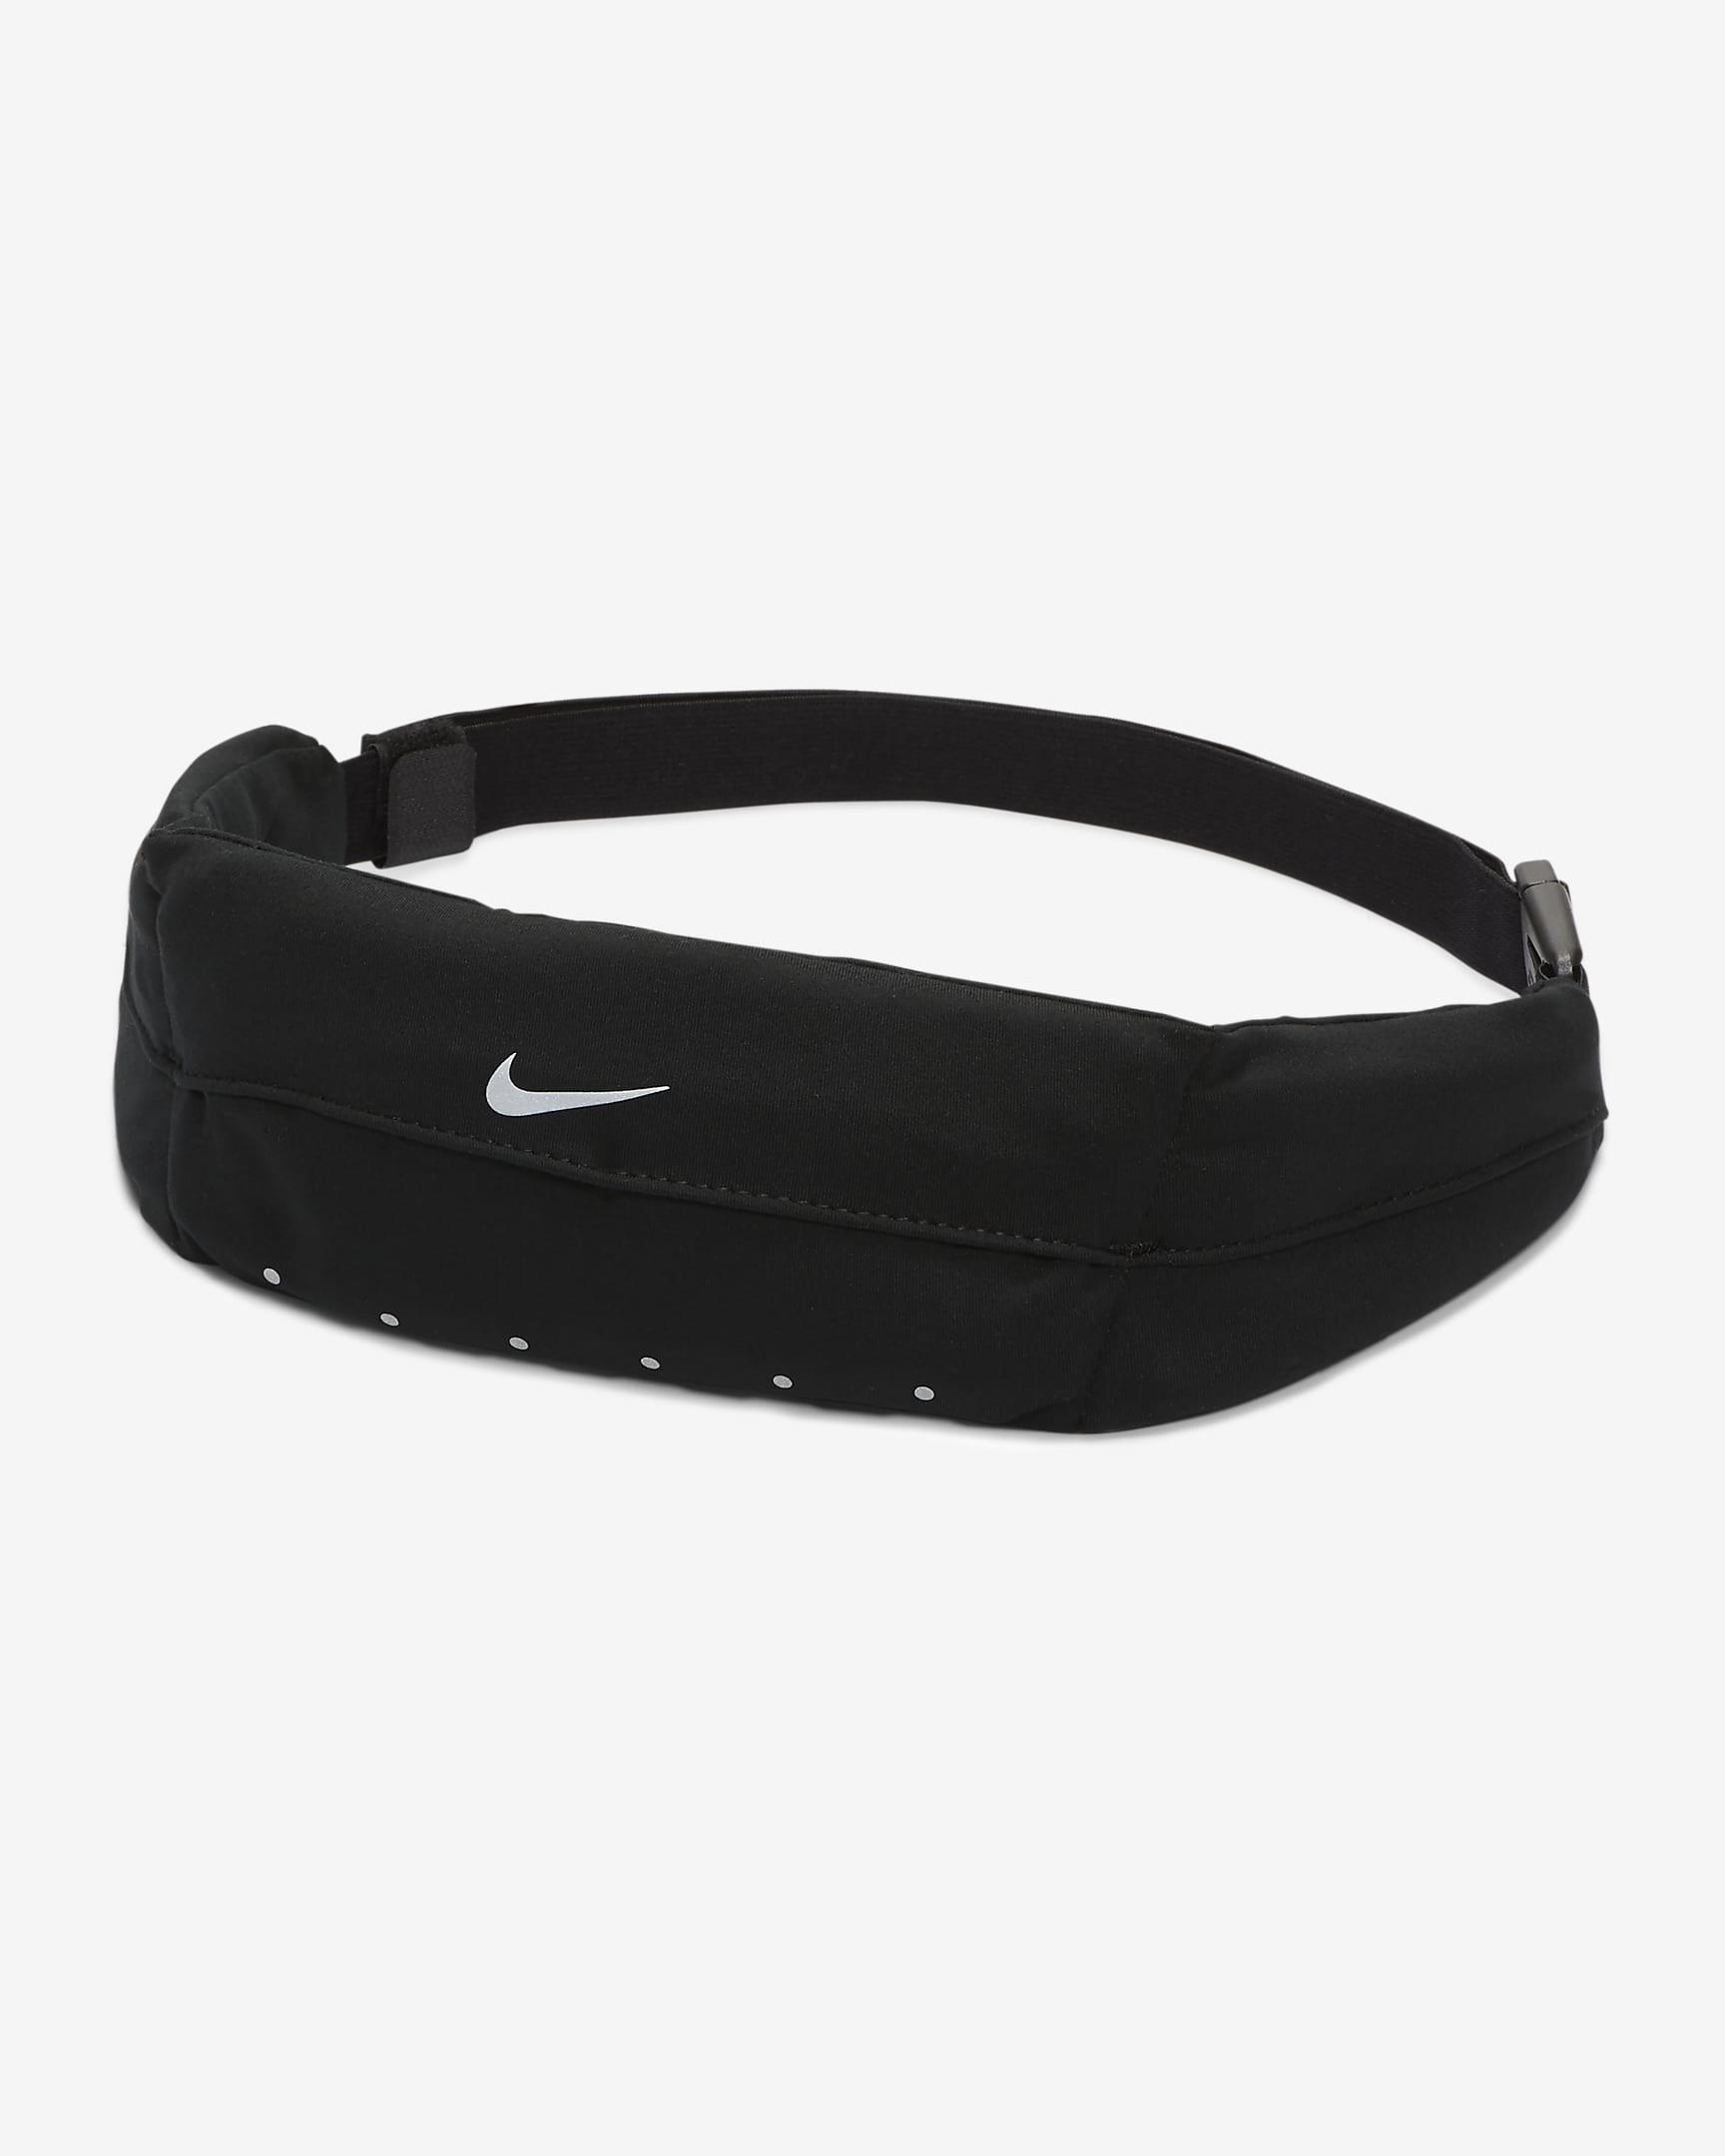 Black fanny pack white white Nike check logo